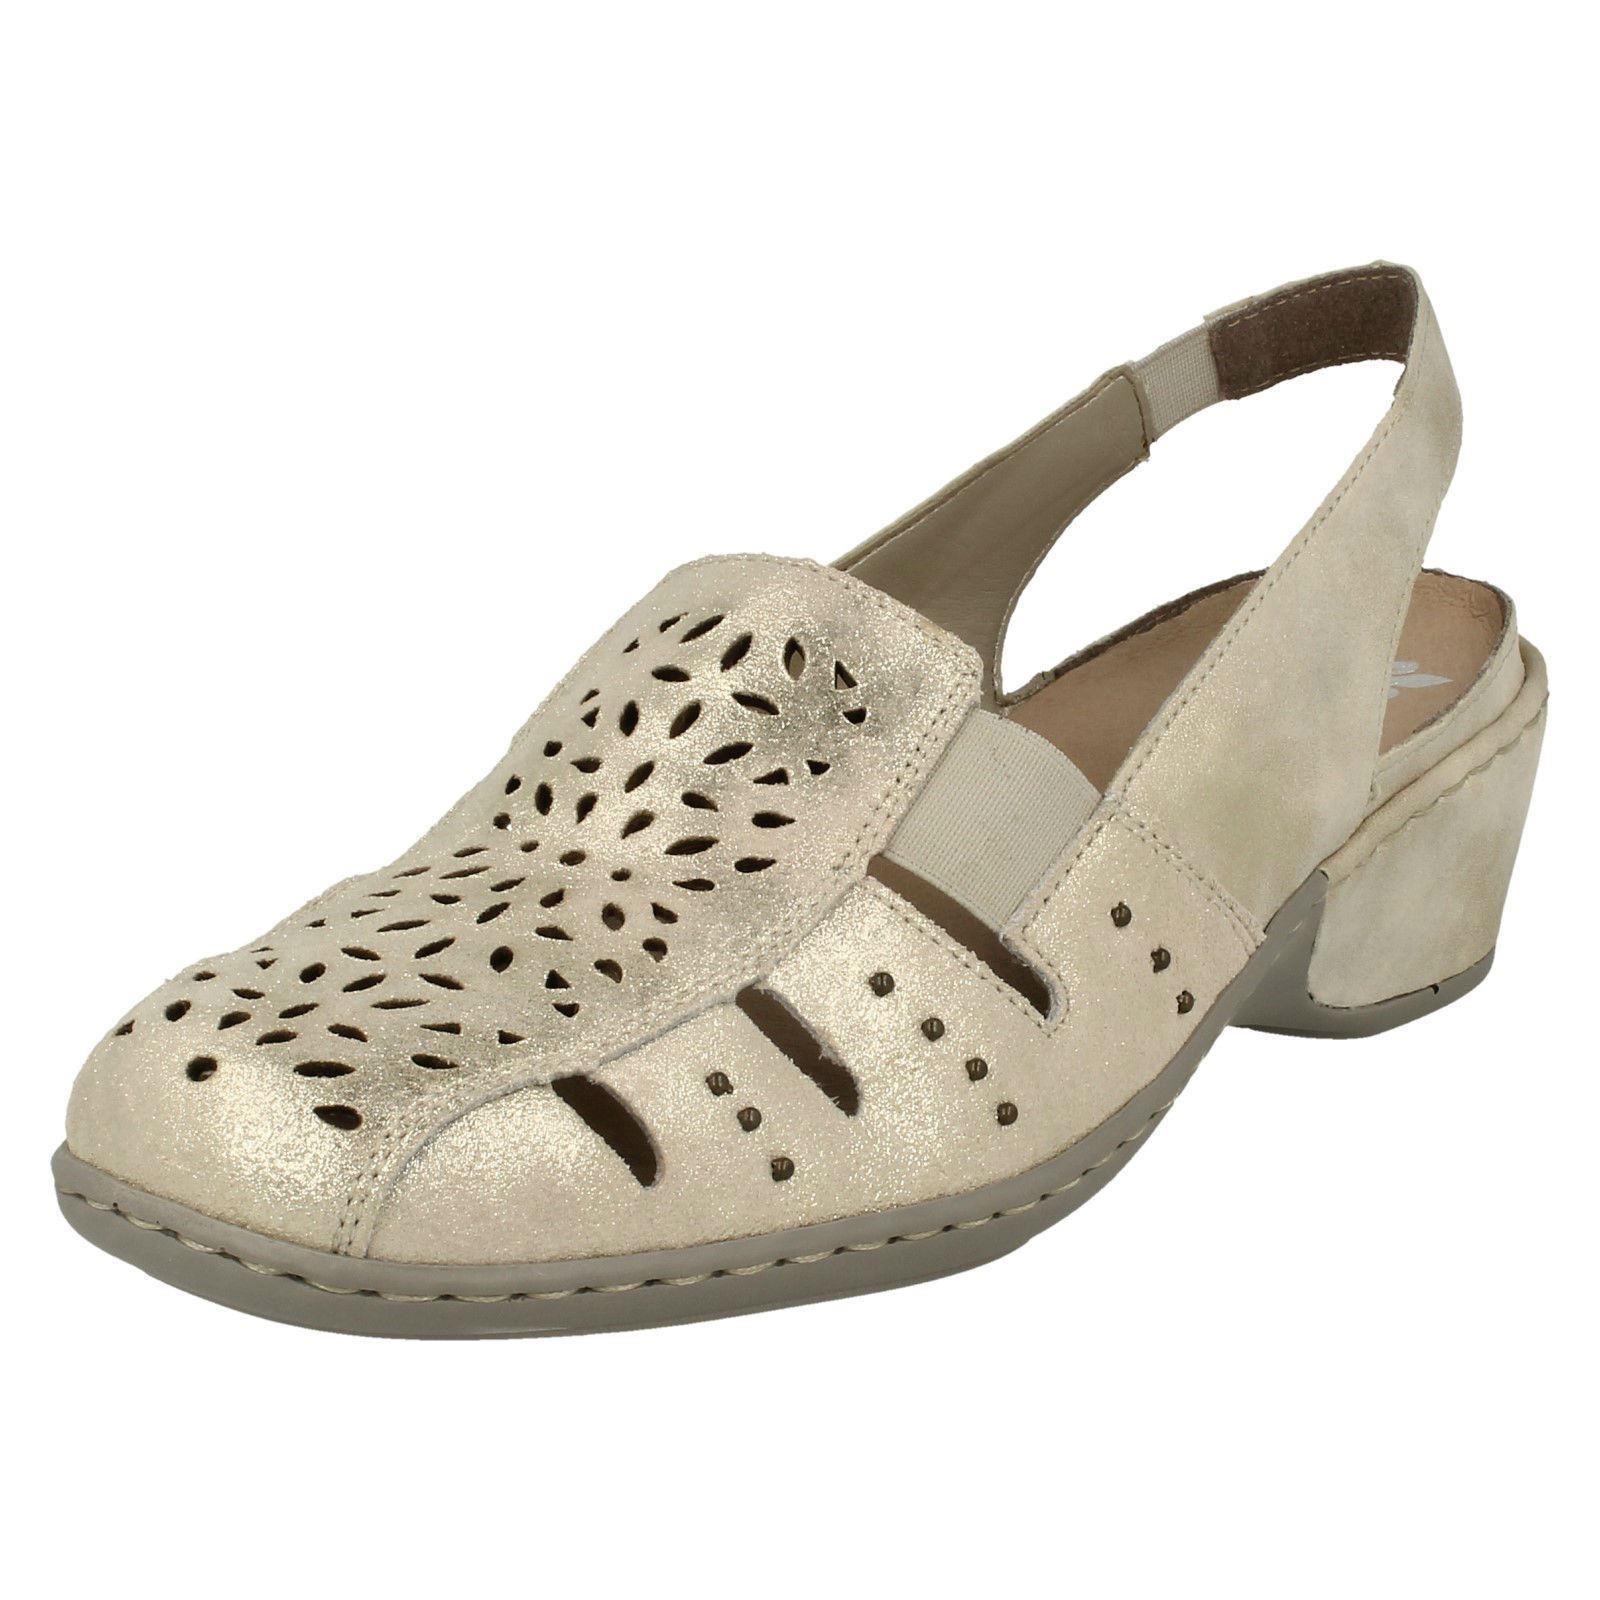 Ladies Beige (Light gold) Leather Sling Back Rieker shoes 47190